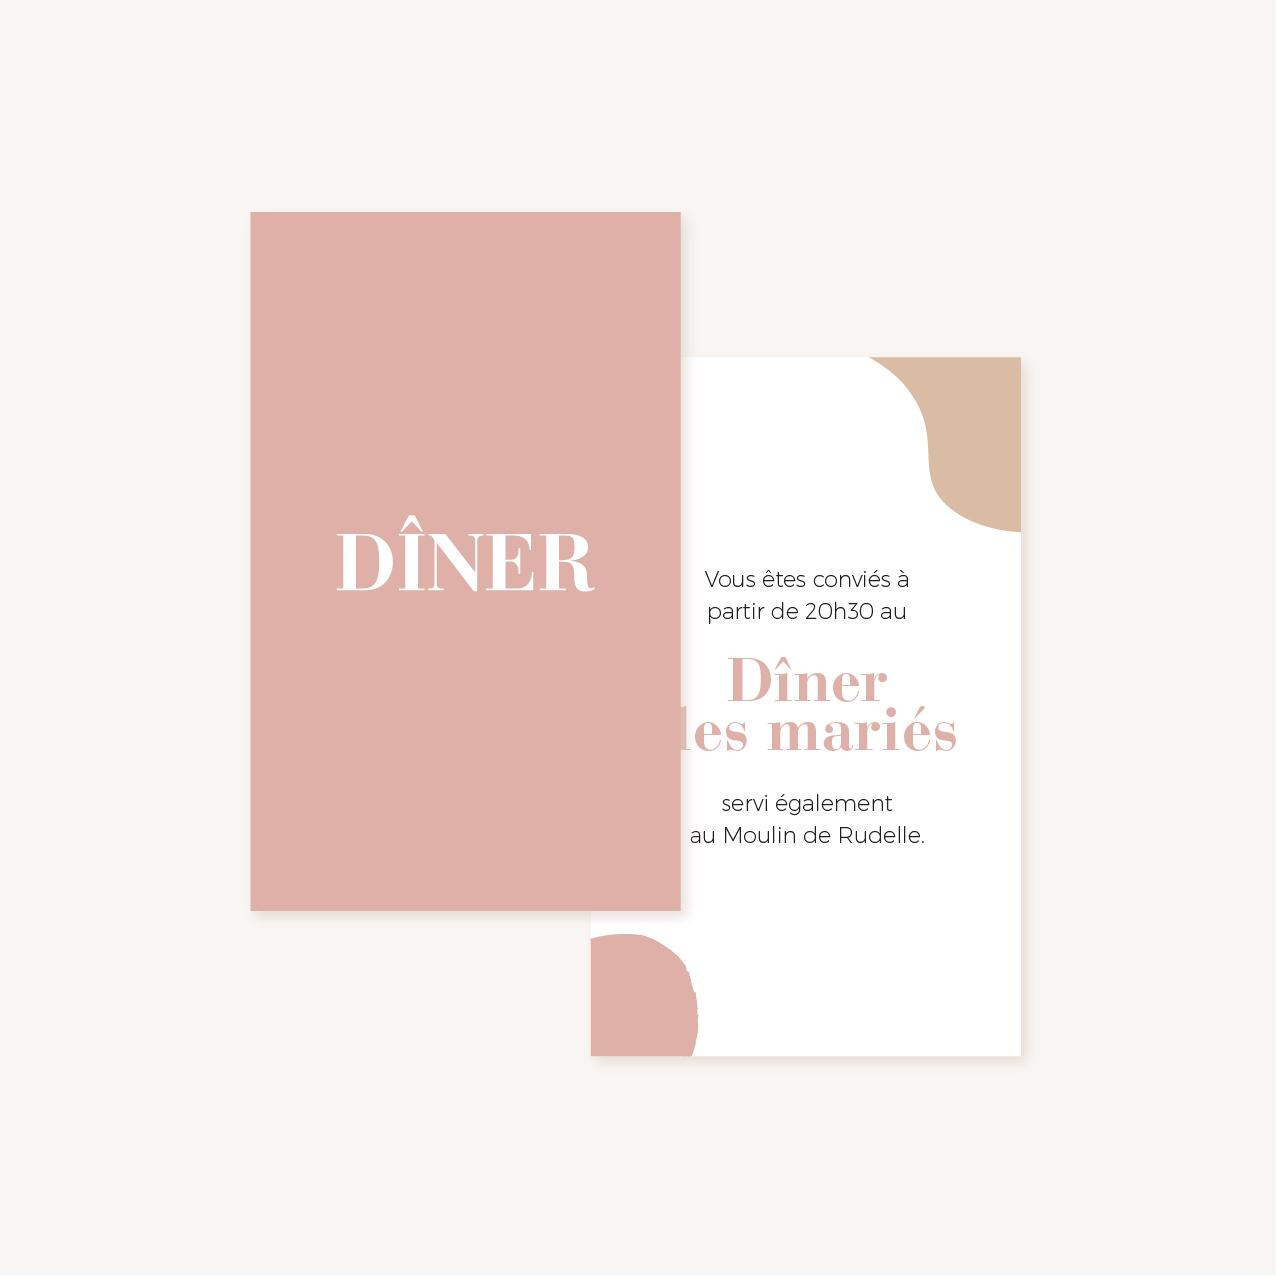 dîner-mariage-abstrait-boho-sahara-couleur-sable-terracotta-beige-desert-22